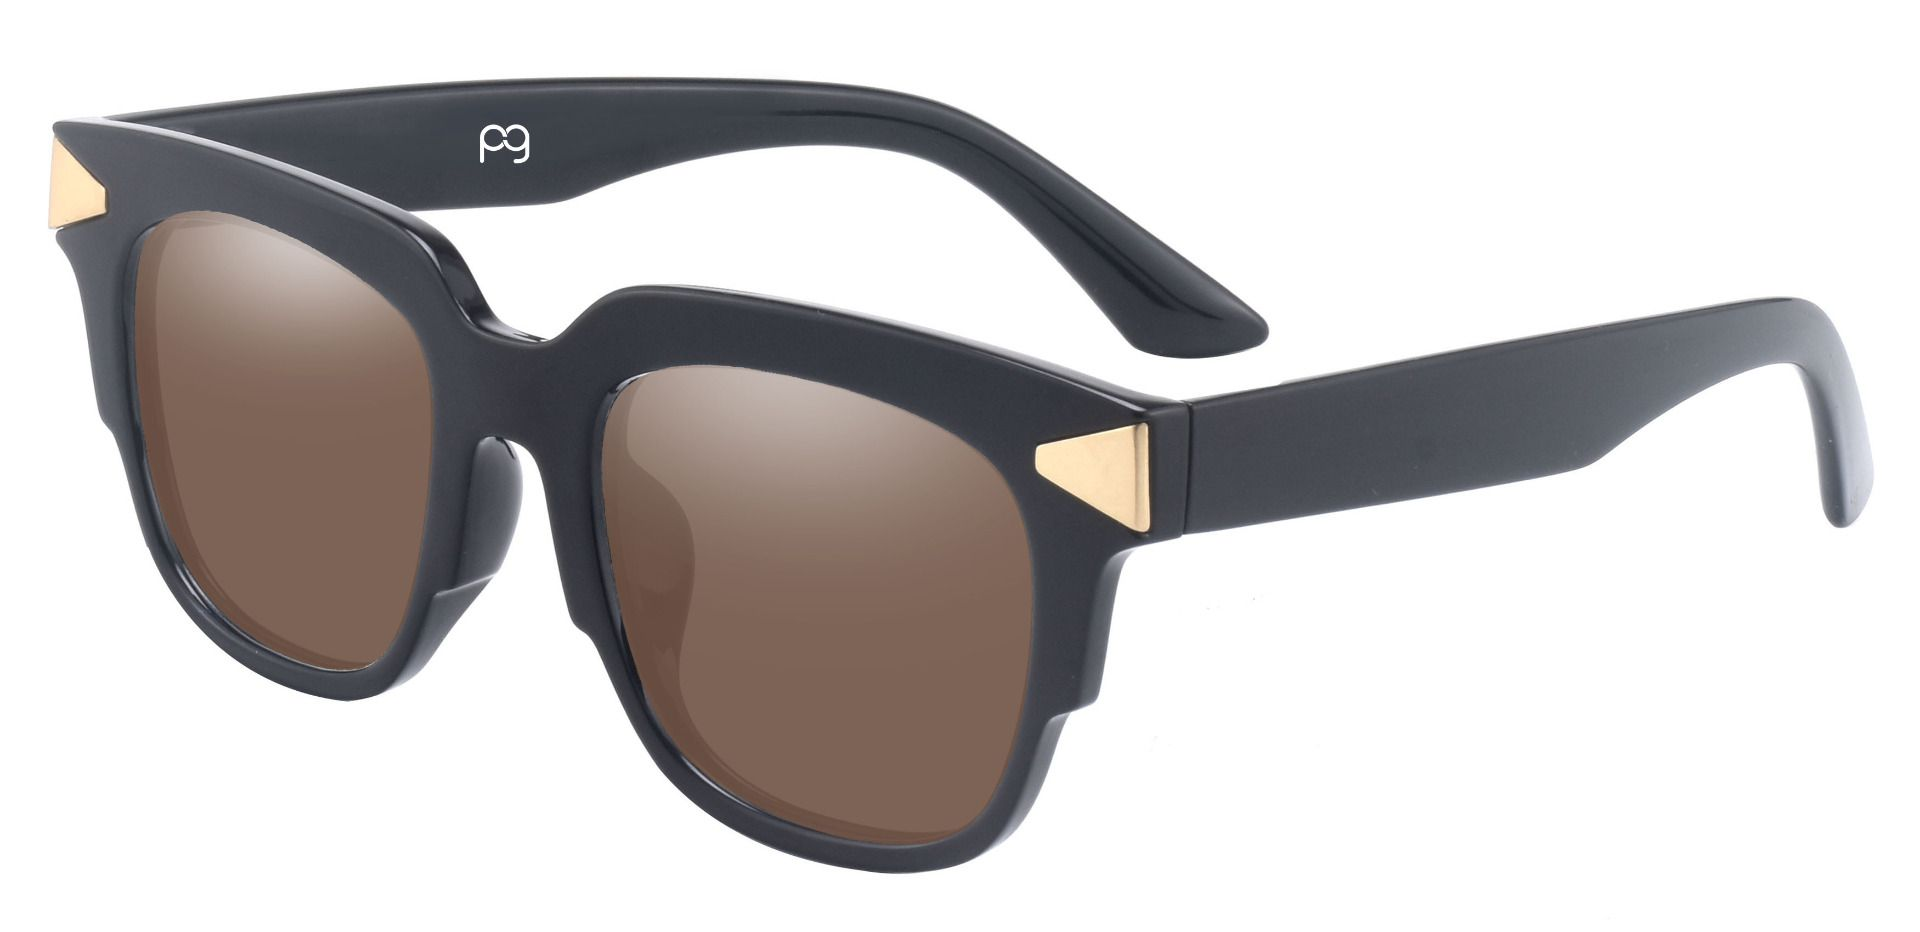 Ardent Square Prescription Sunglasses - Black Frame With Brown Lenses